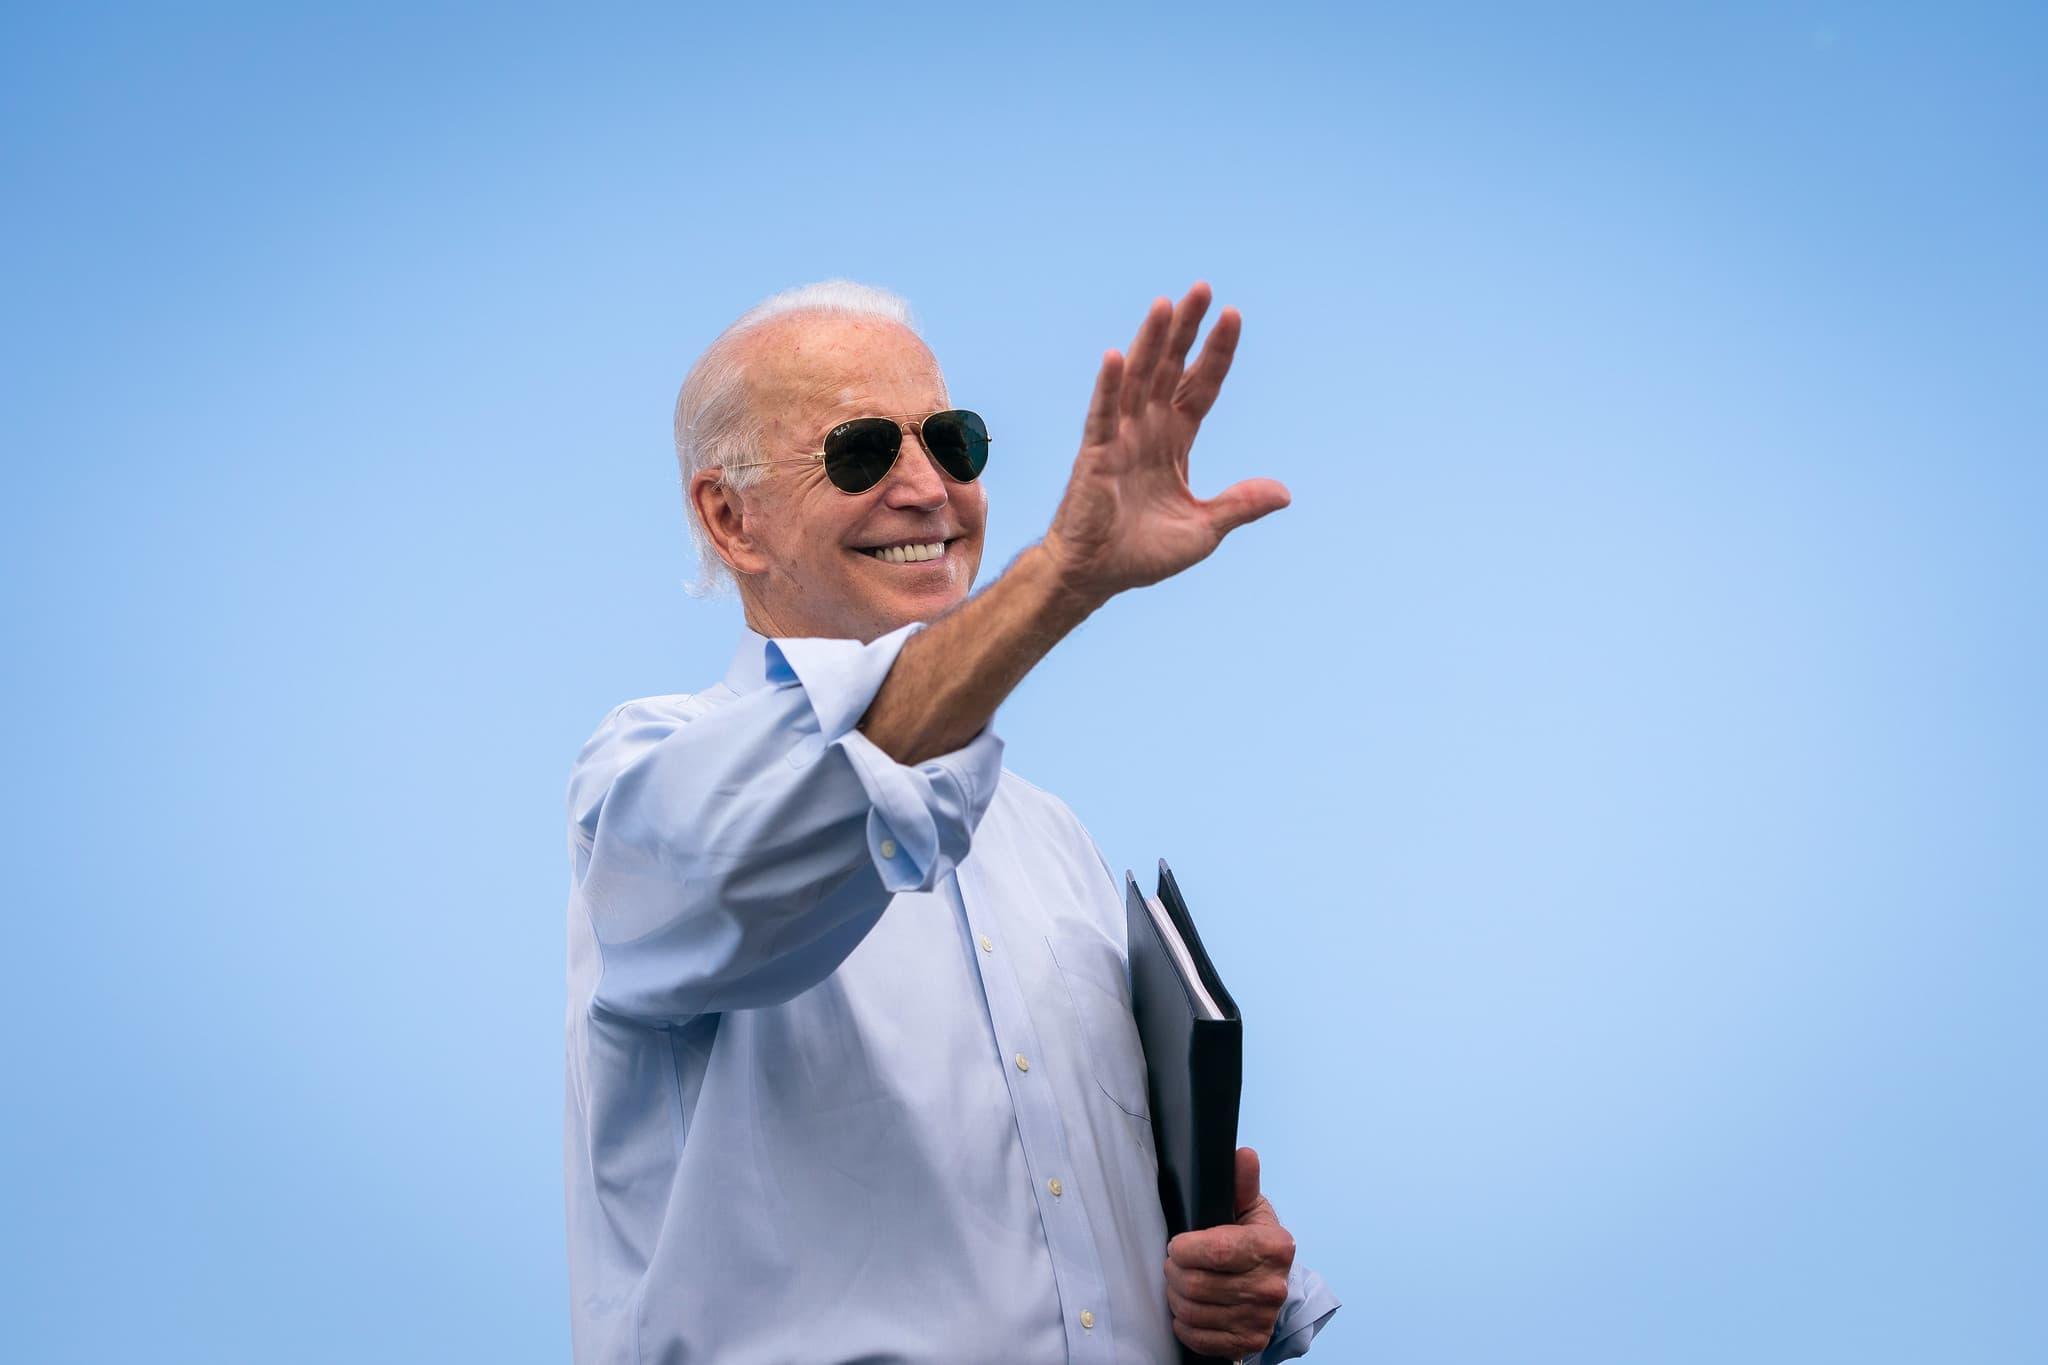 Joe Biden, equality act, lgbtq